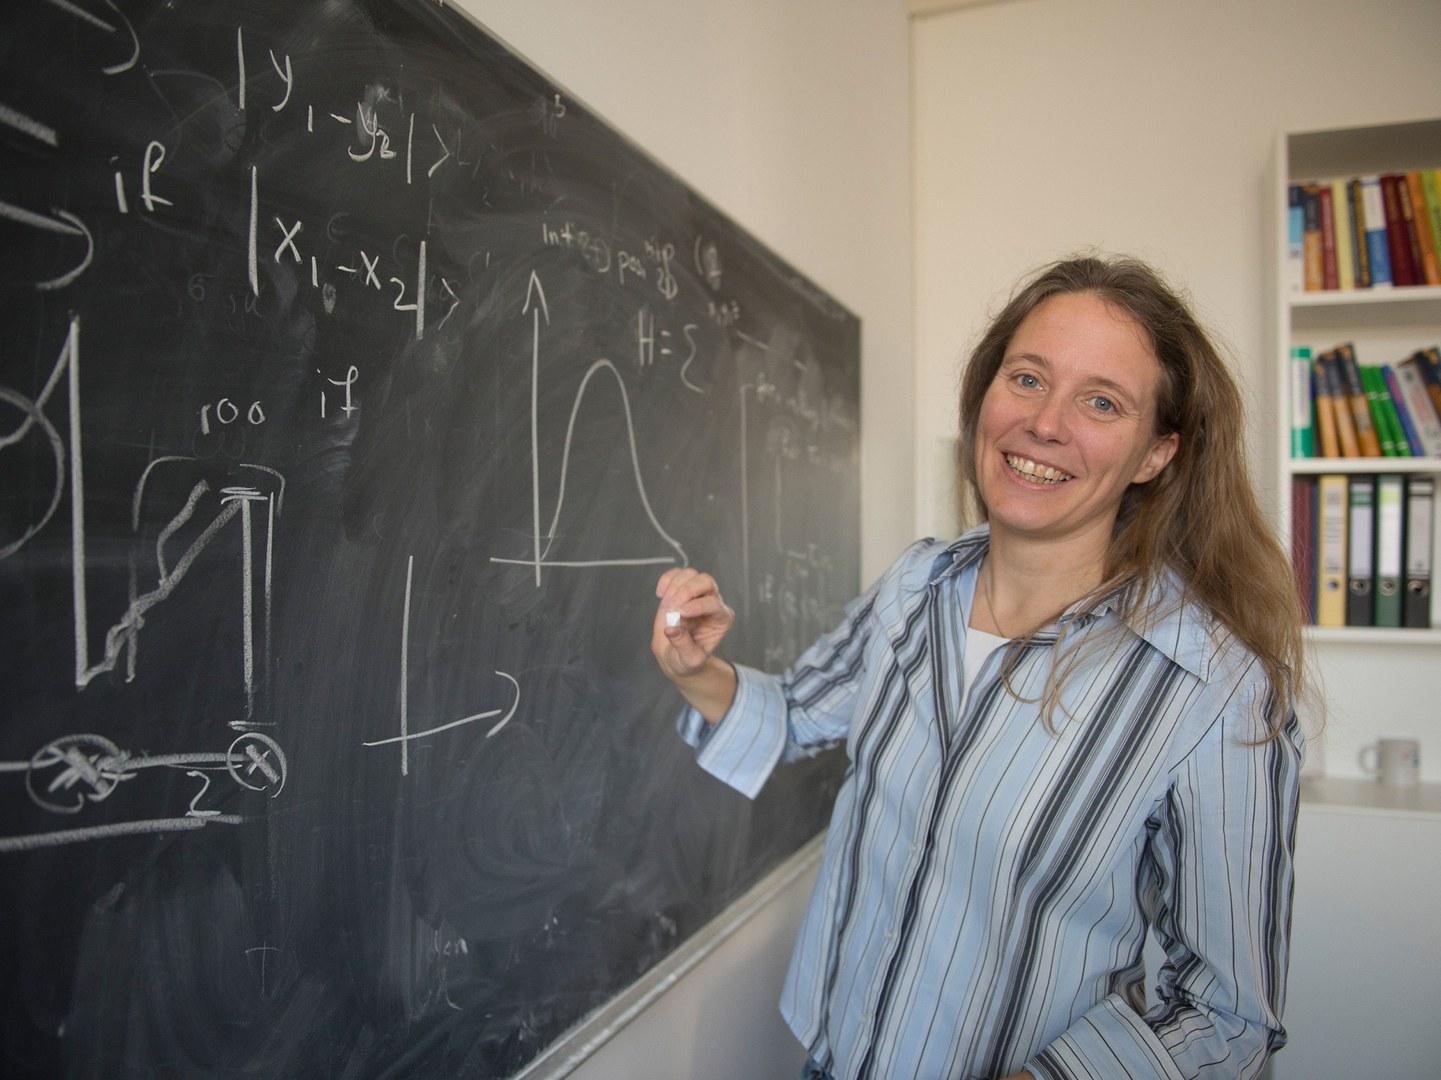 Prof. Dr. Corinna Kollath